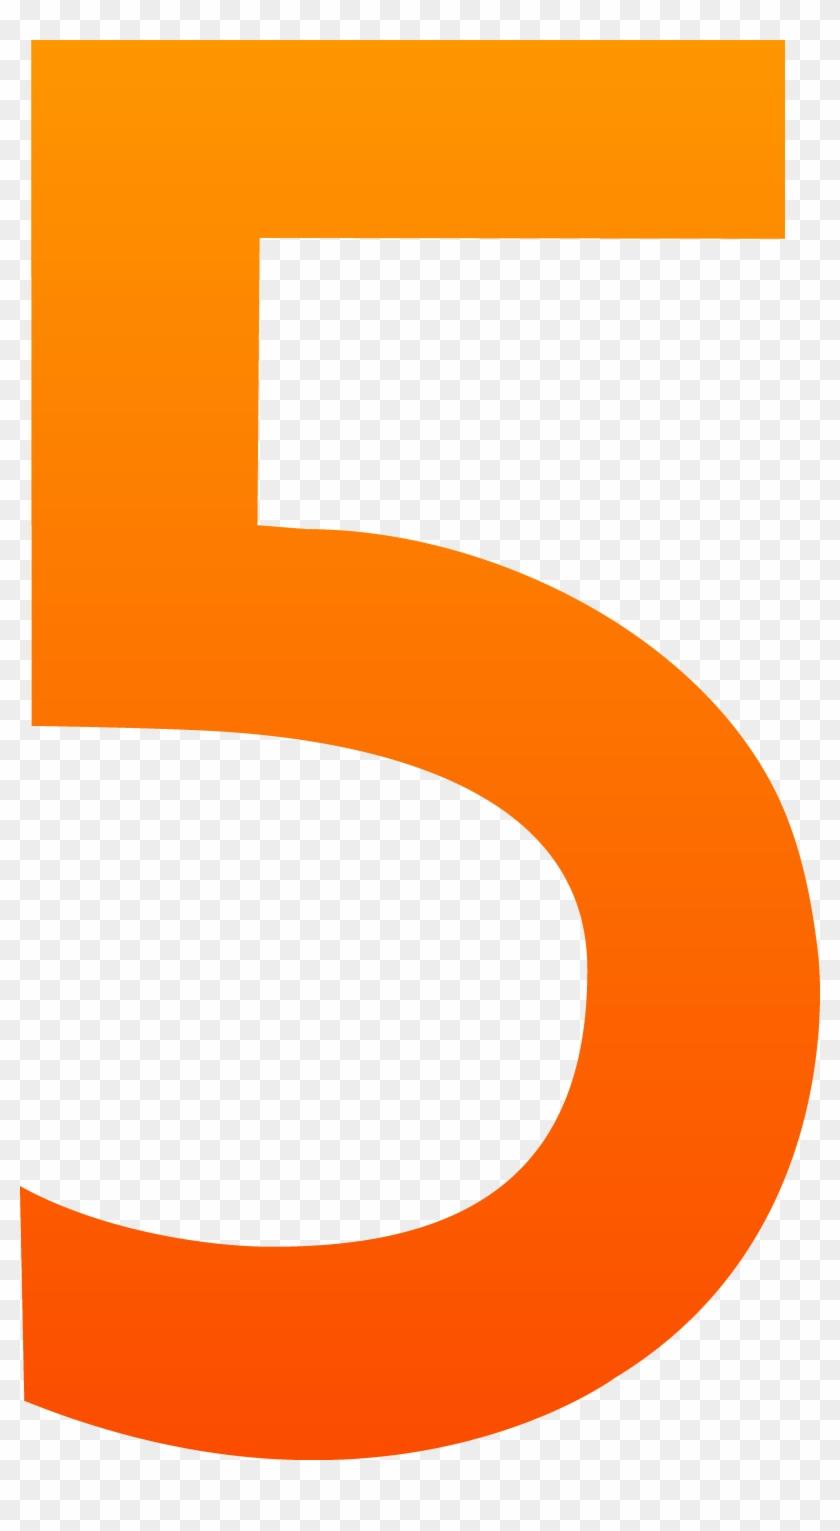 Five Number Clip Art - 5 Clipart #32397